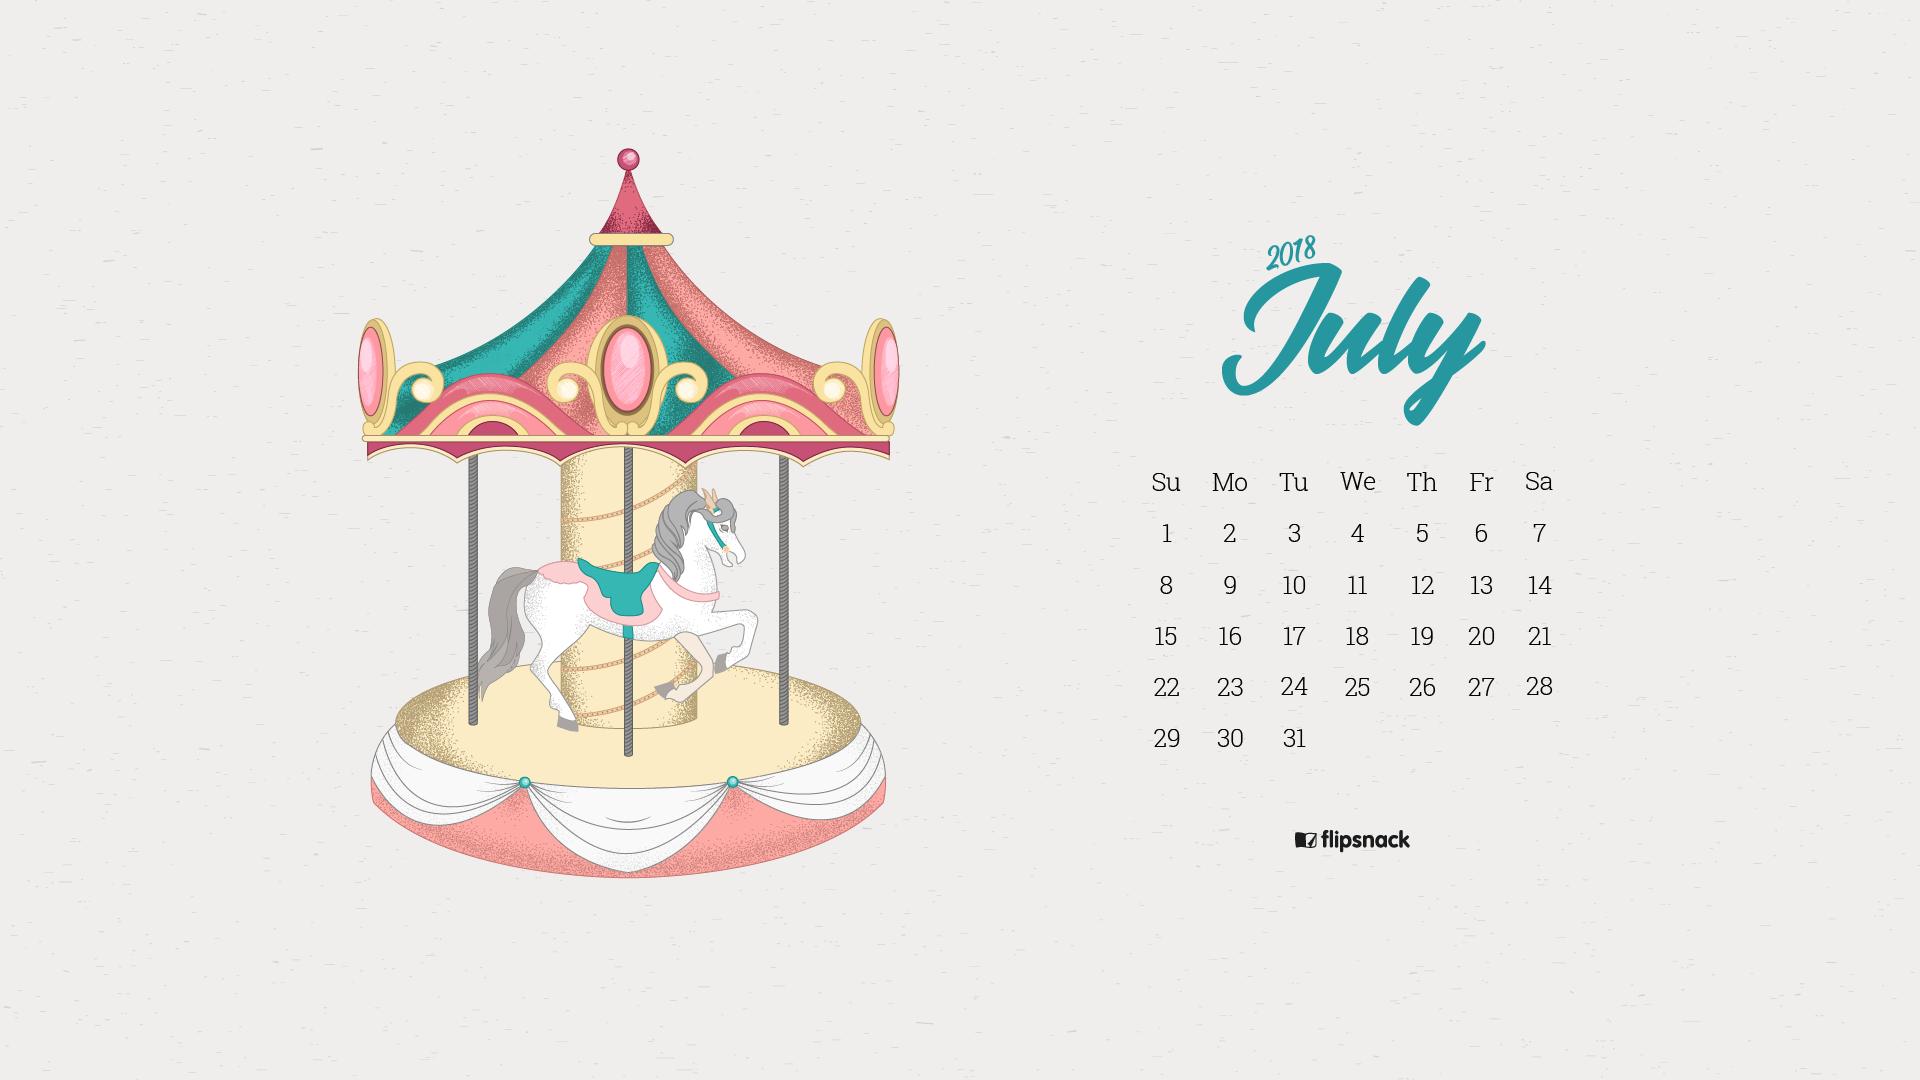 July 2018 wallpaper calendar   Flipsnack Blog 1920x1080